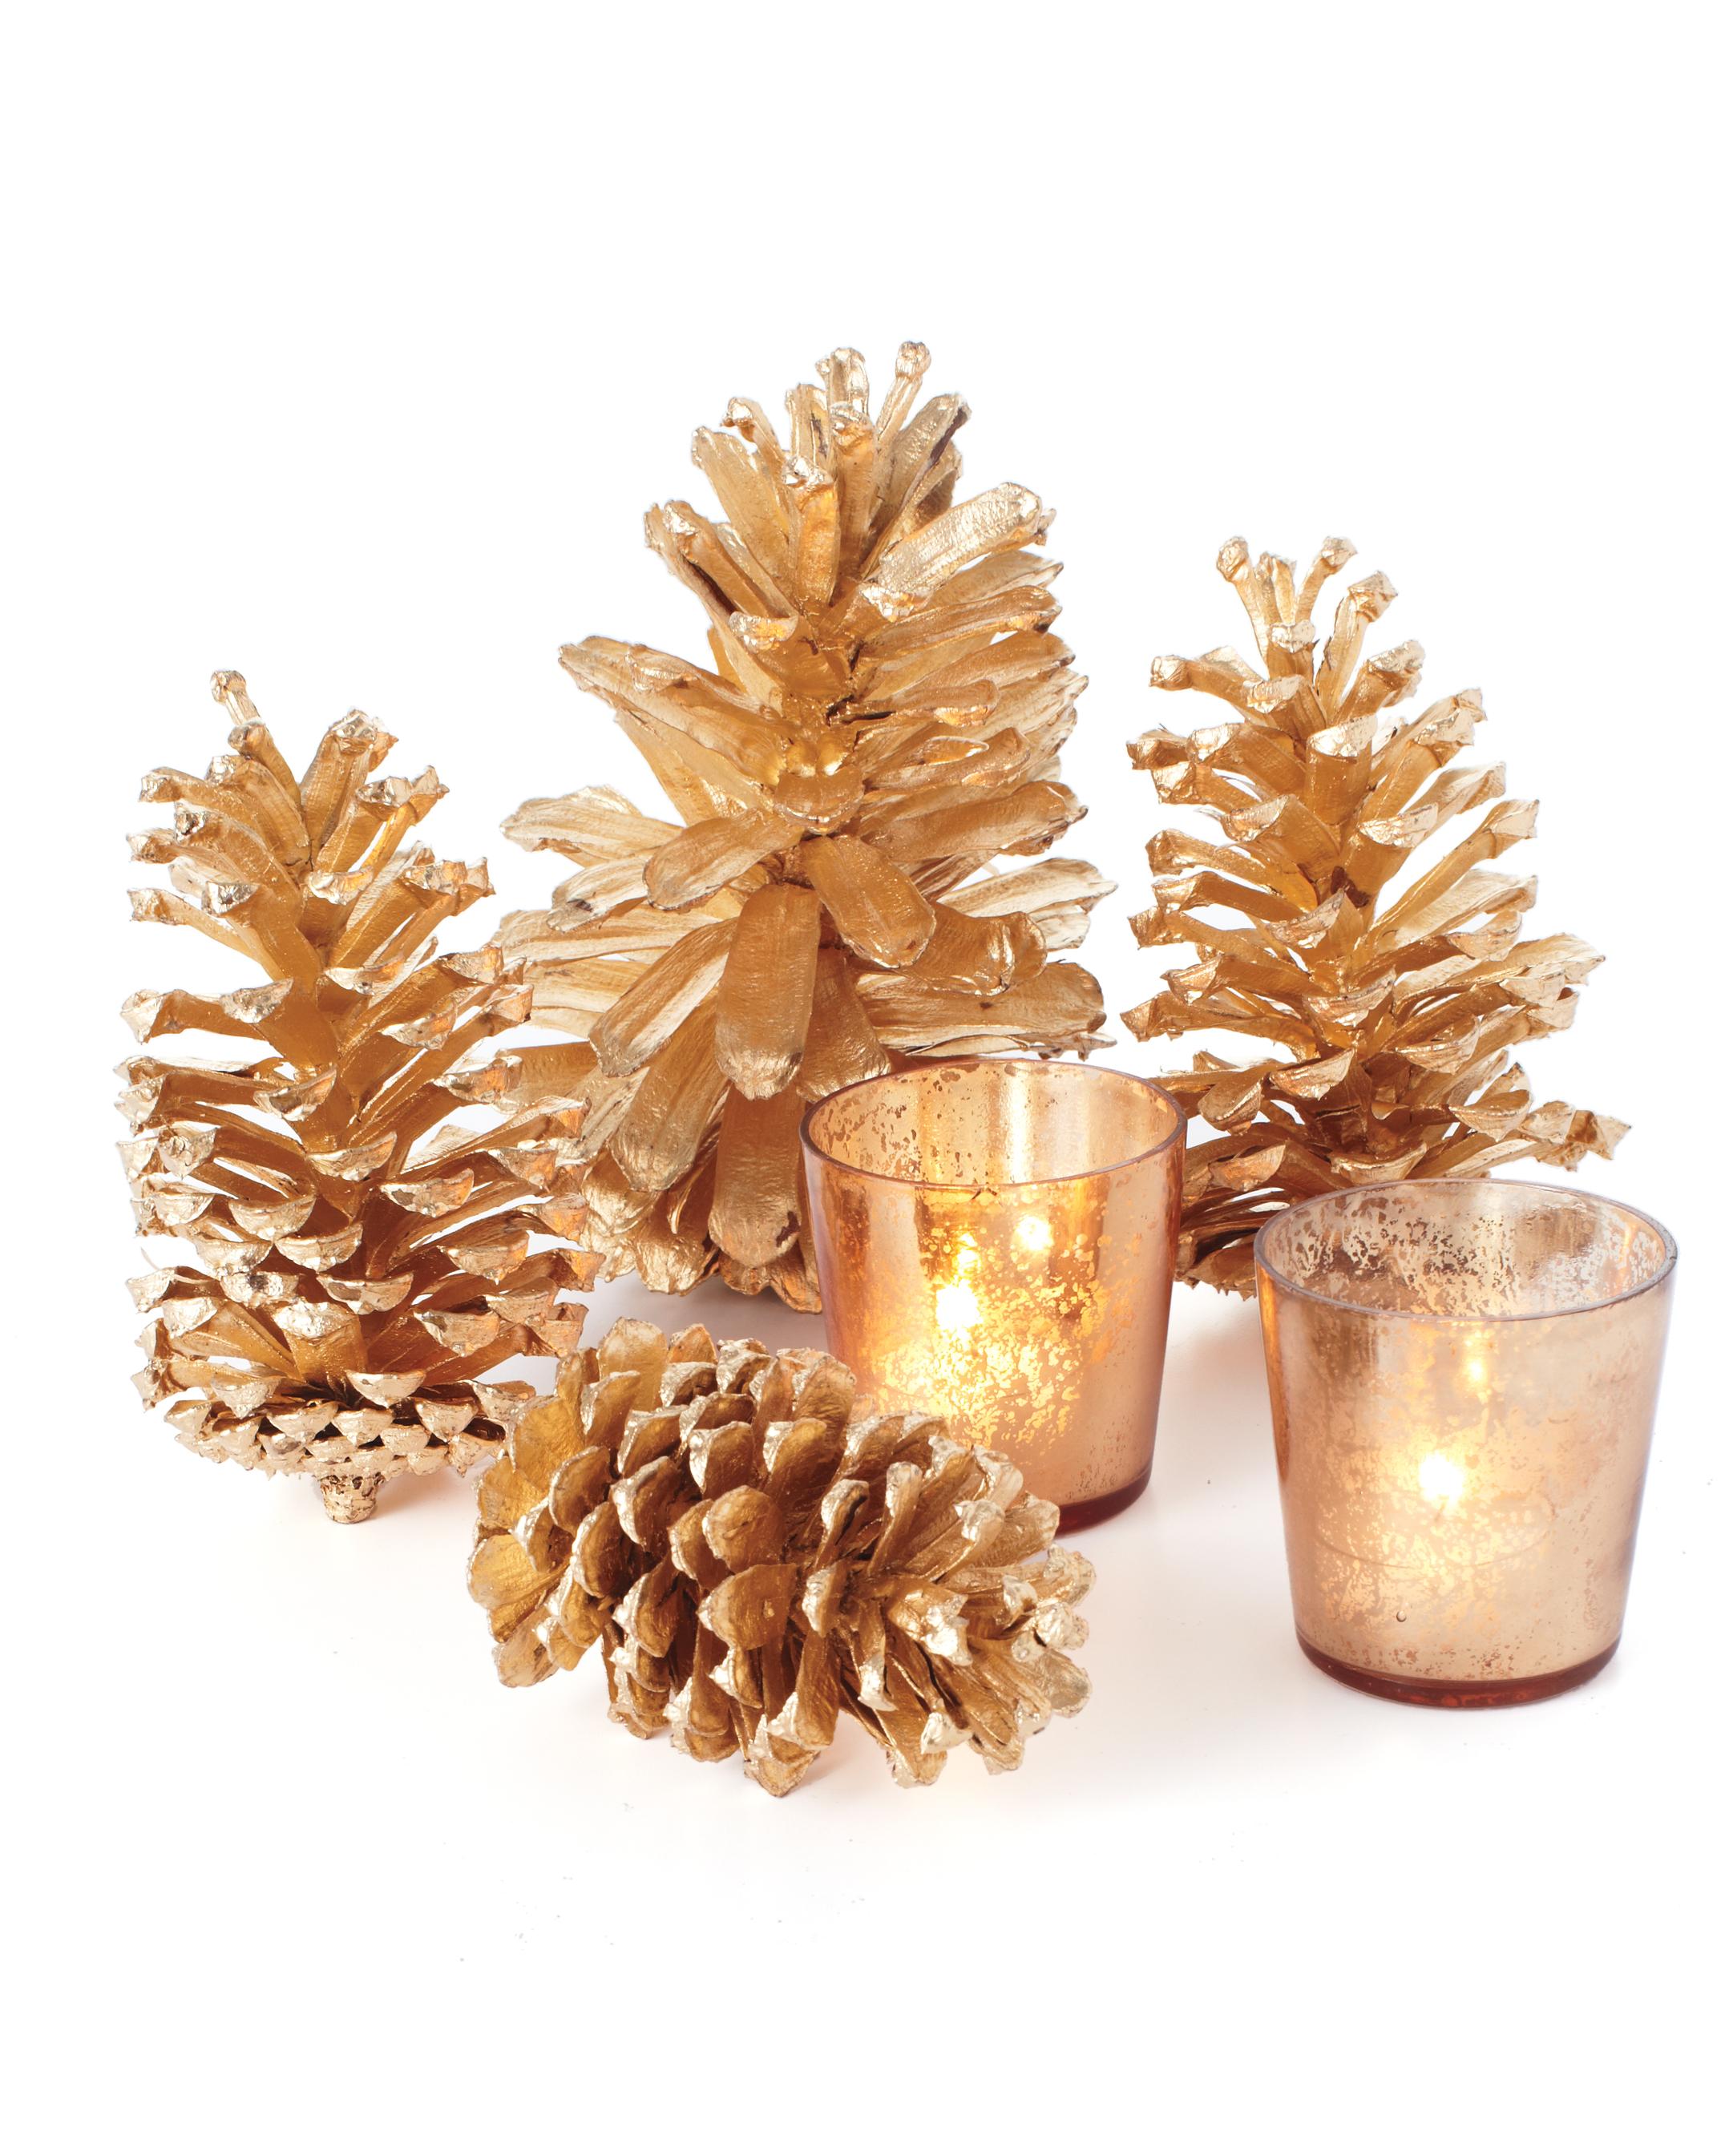 pinecones-172-mwd110671.jpg